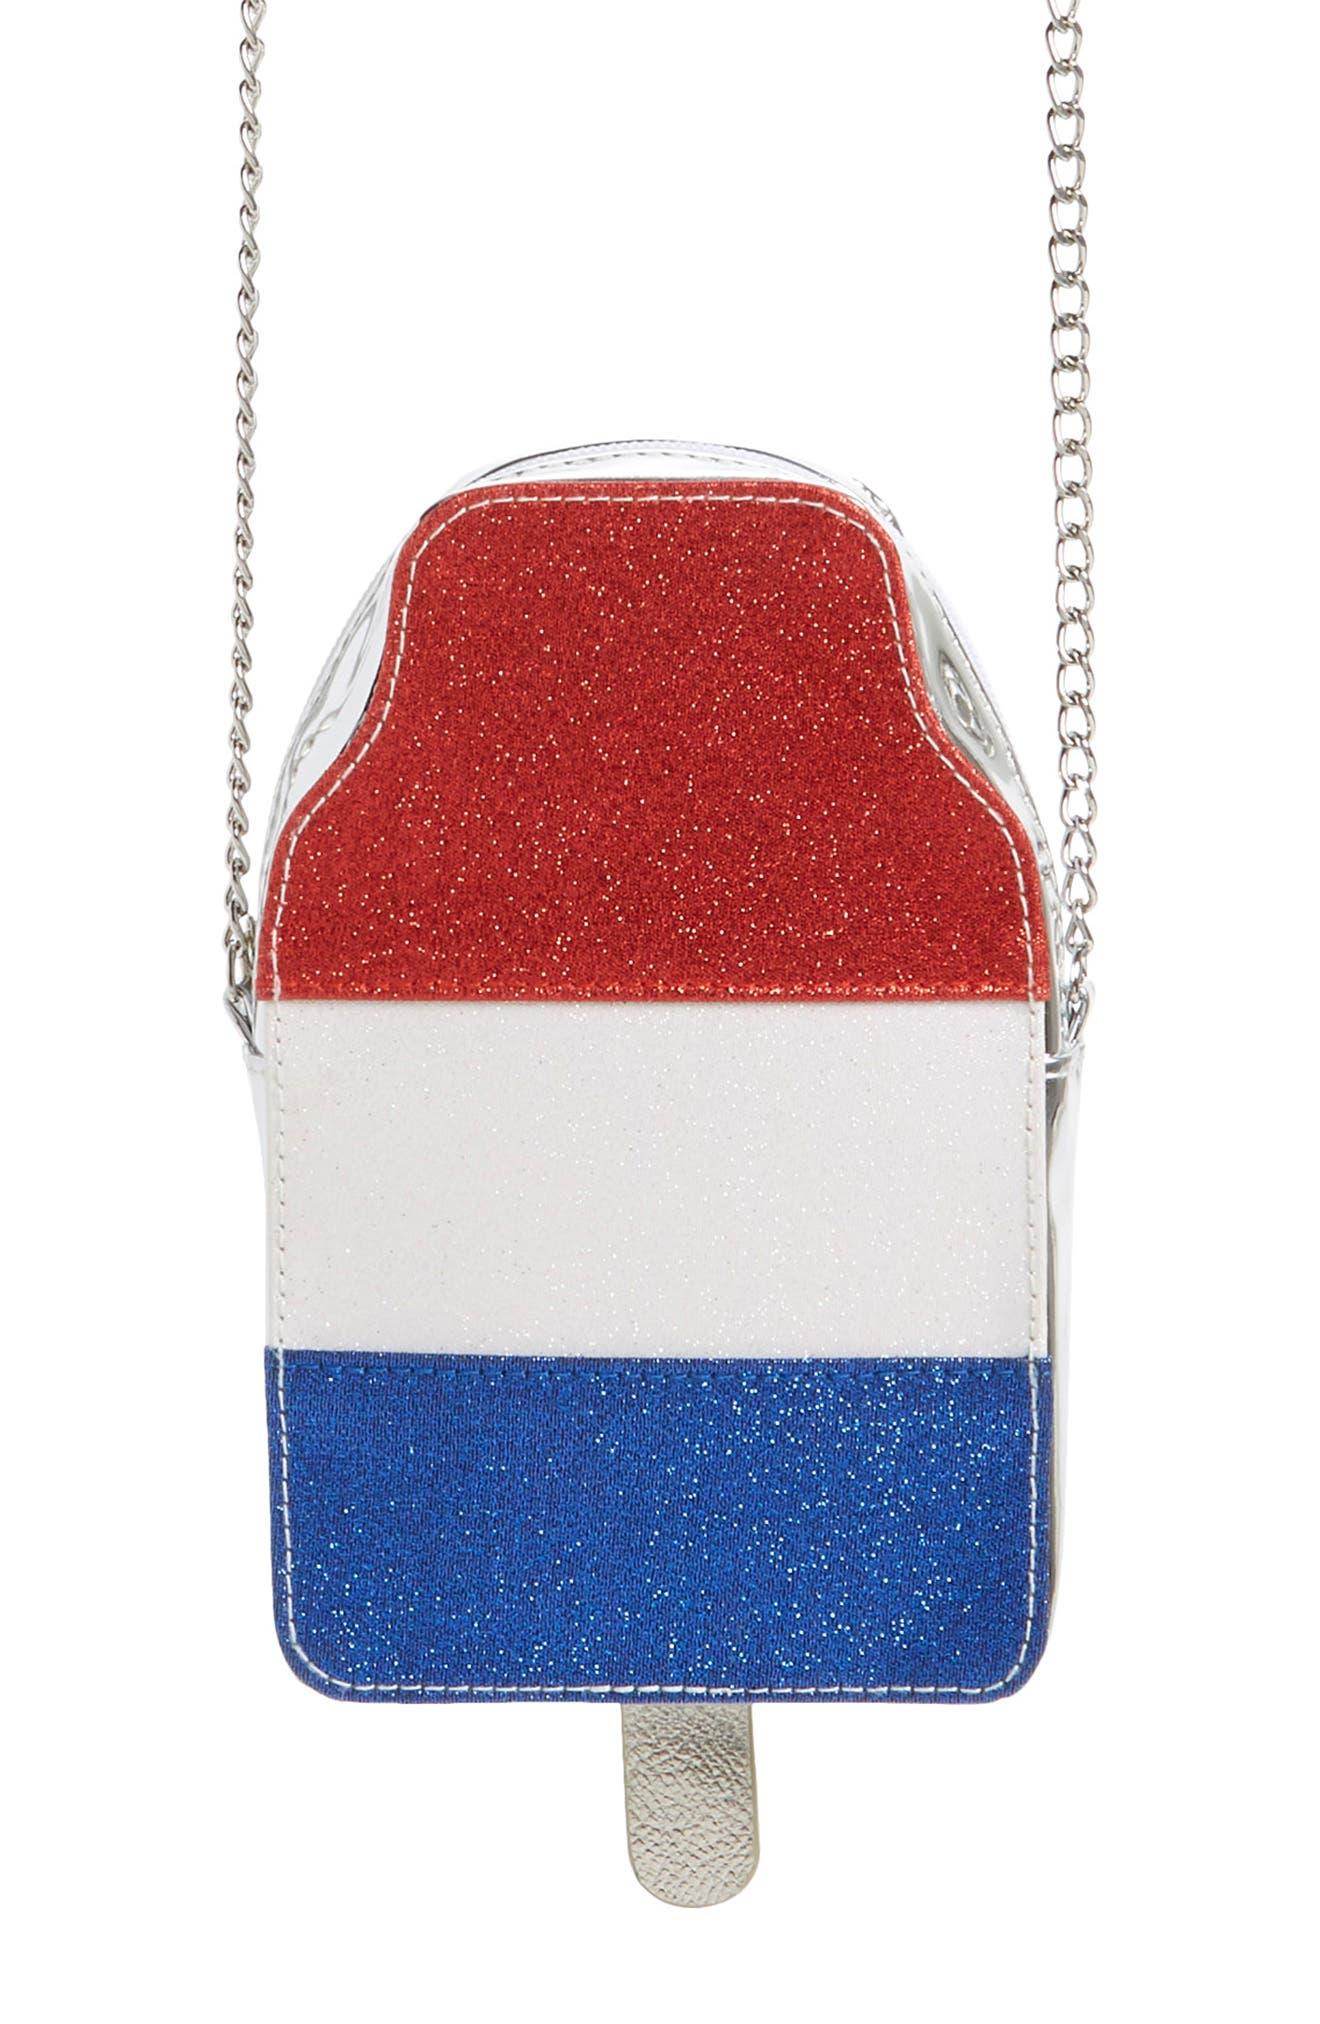 Girls Capelli New York Patriotic Stripe Ice Pop Crossbody Bag  Metallic